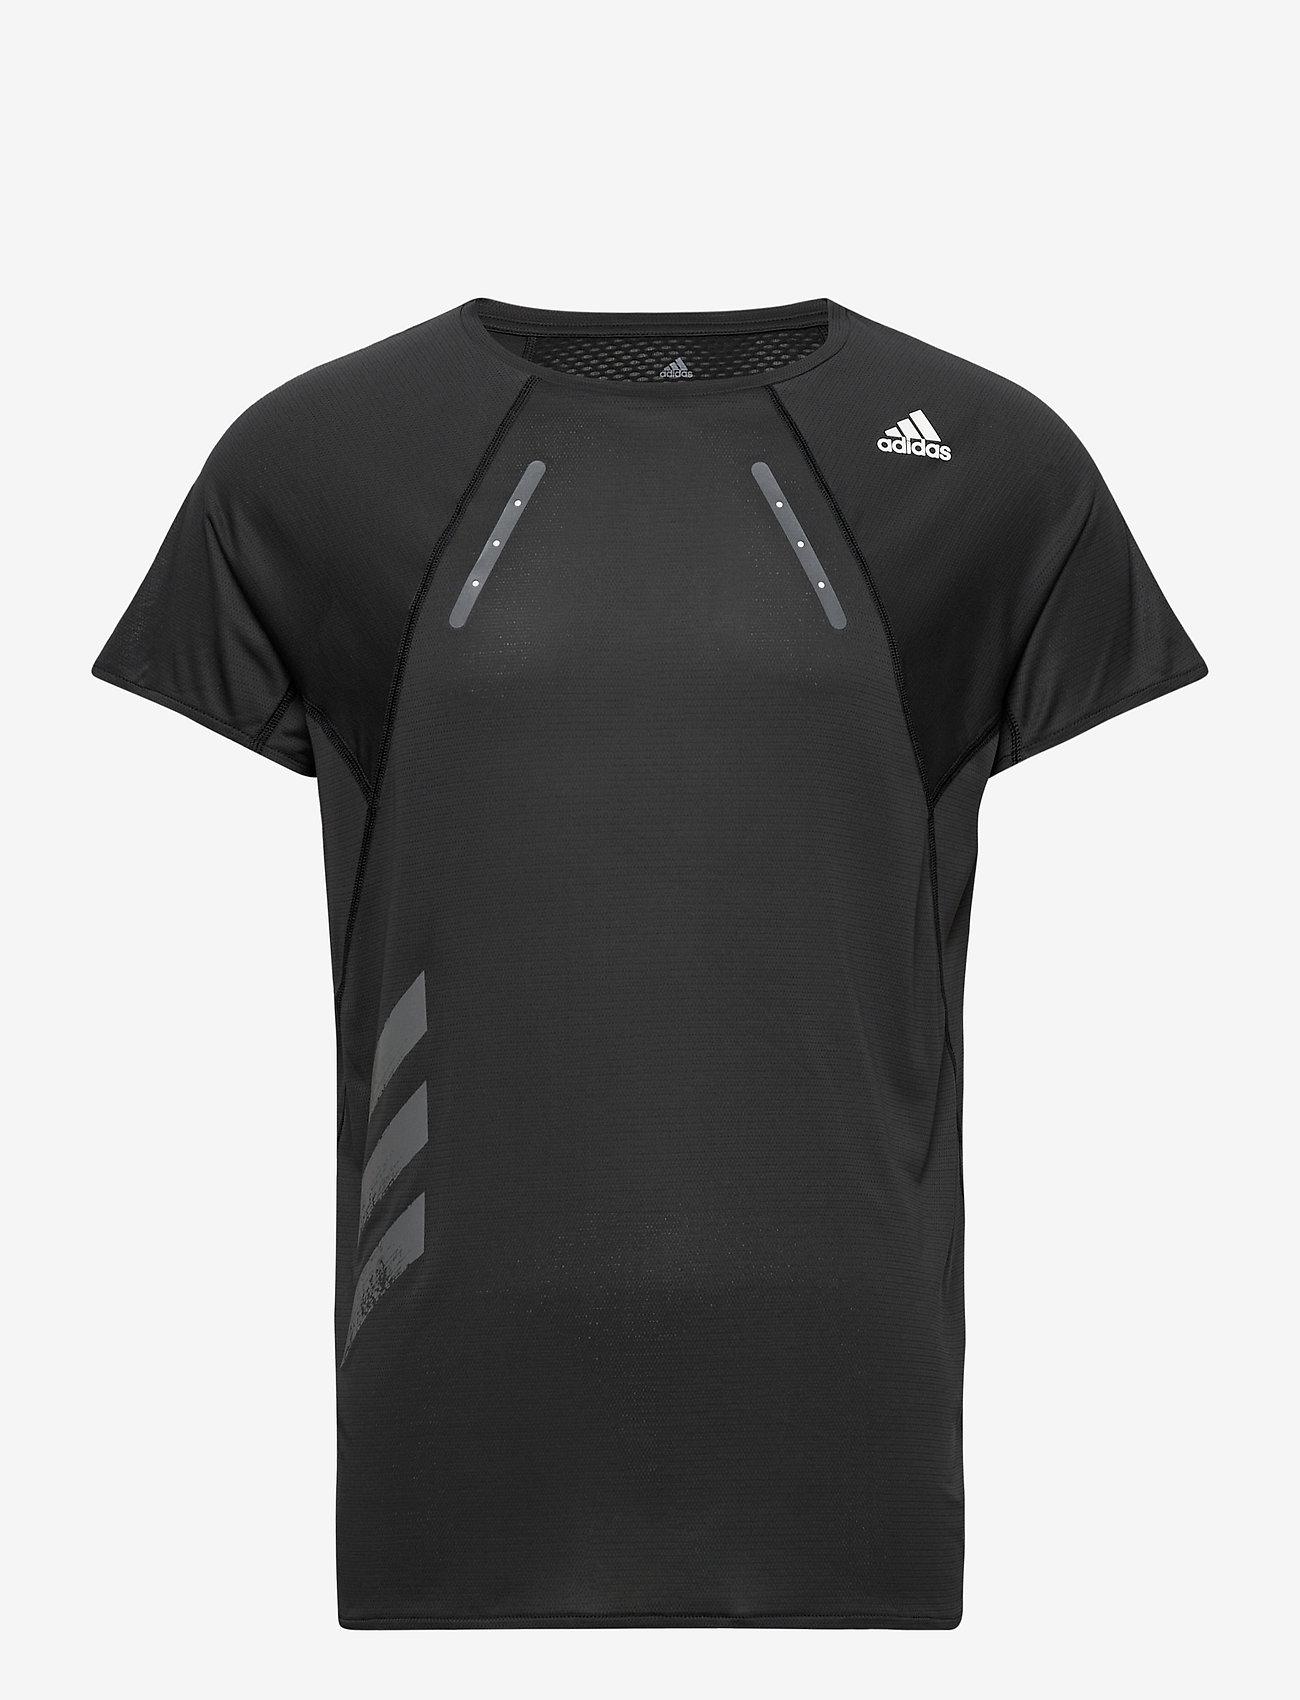 adidas Performance - HEAT.RDY TEE M - sportoberteile - black - 0